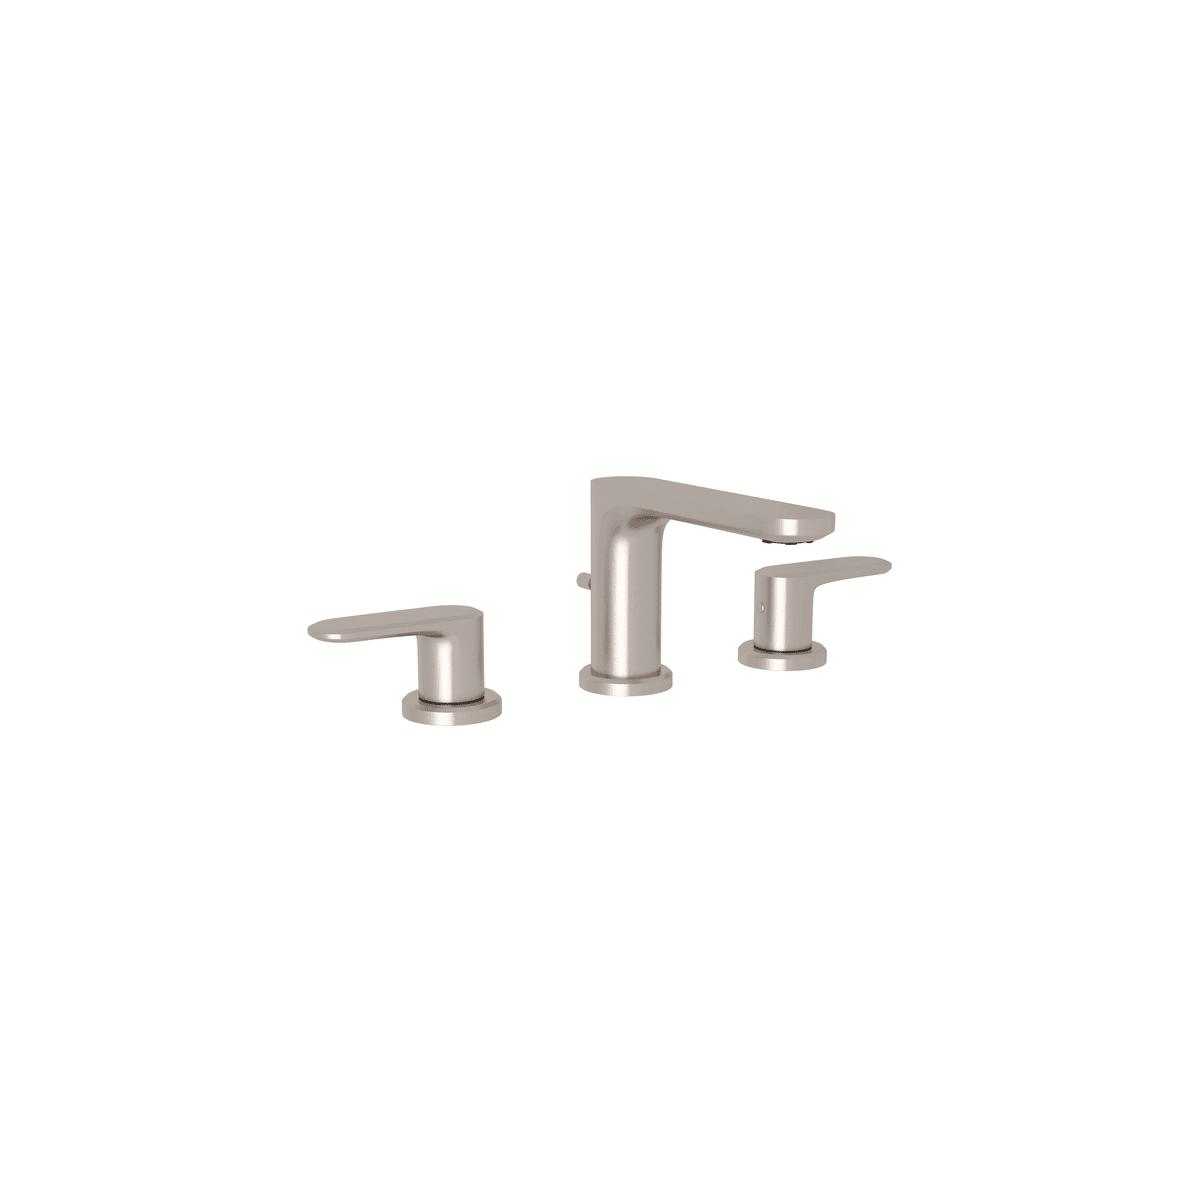 Rohl LV102L STN 2. Meda 1.2 GPM Widespread Bathroom Faucet ...